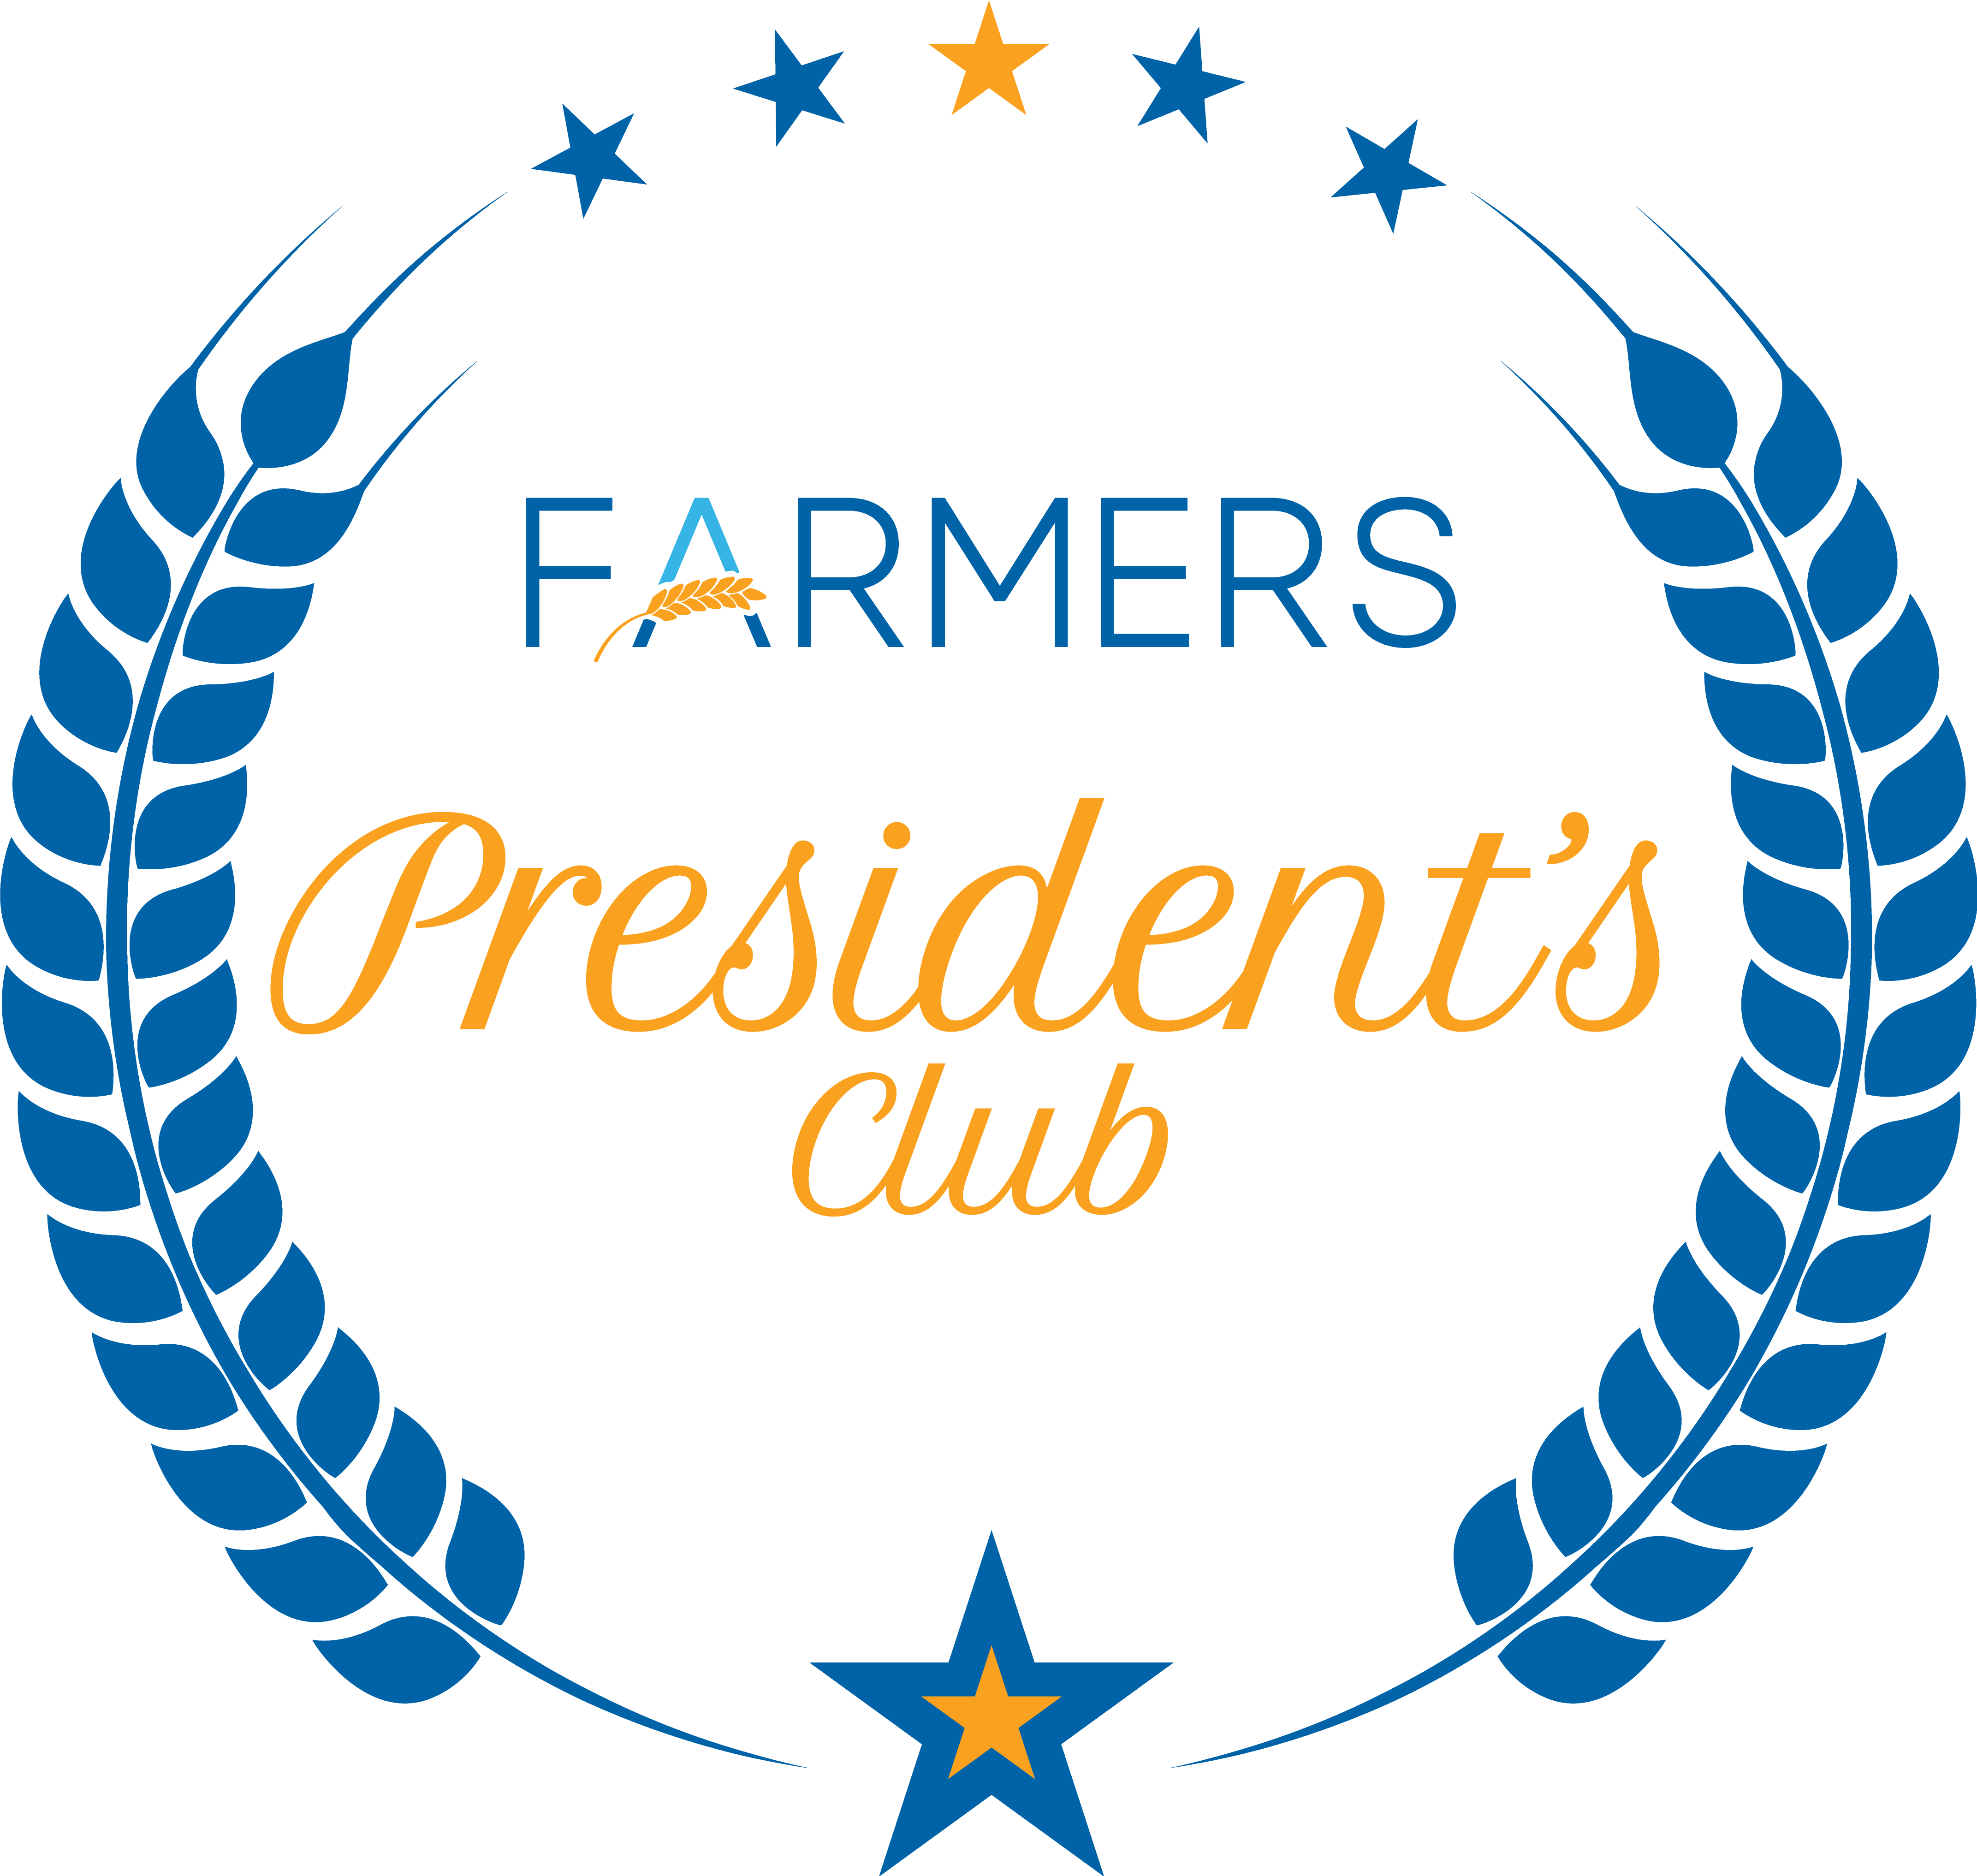 Farmers President's Club